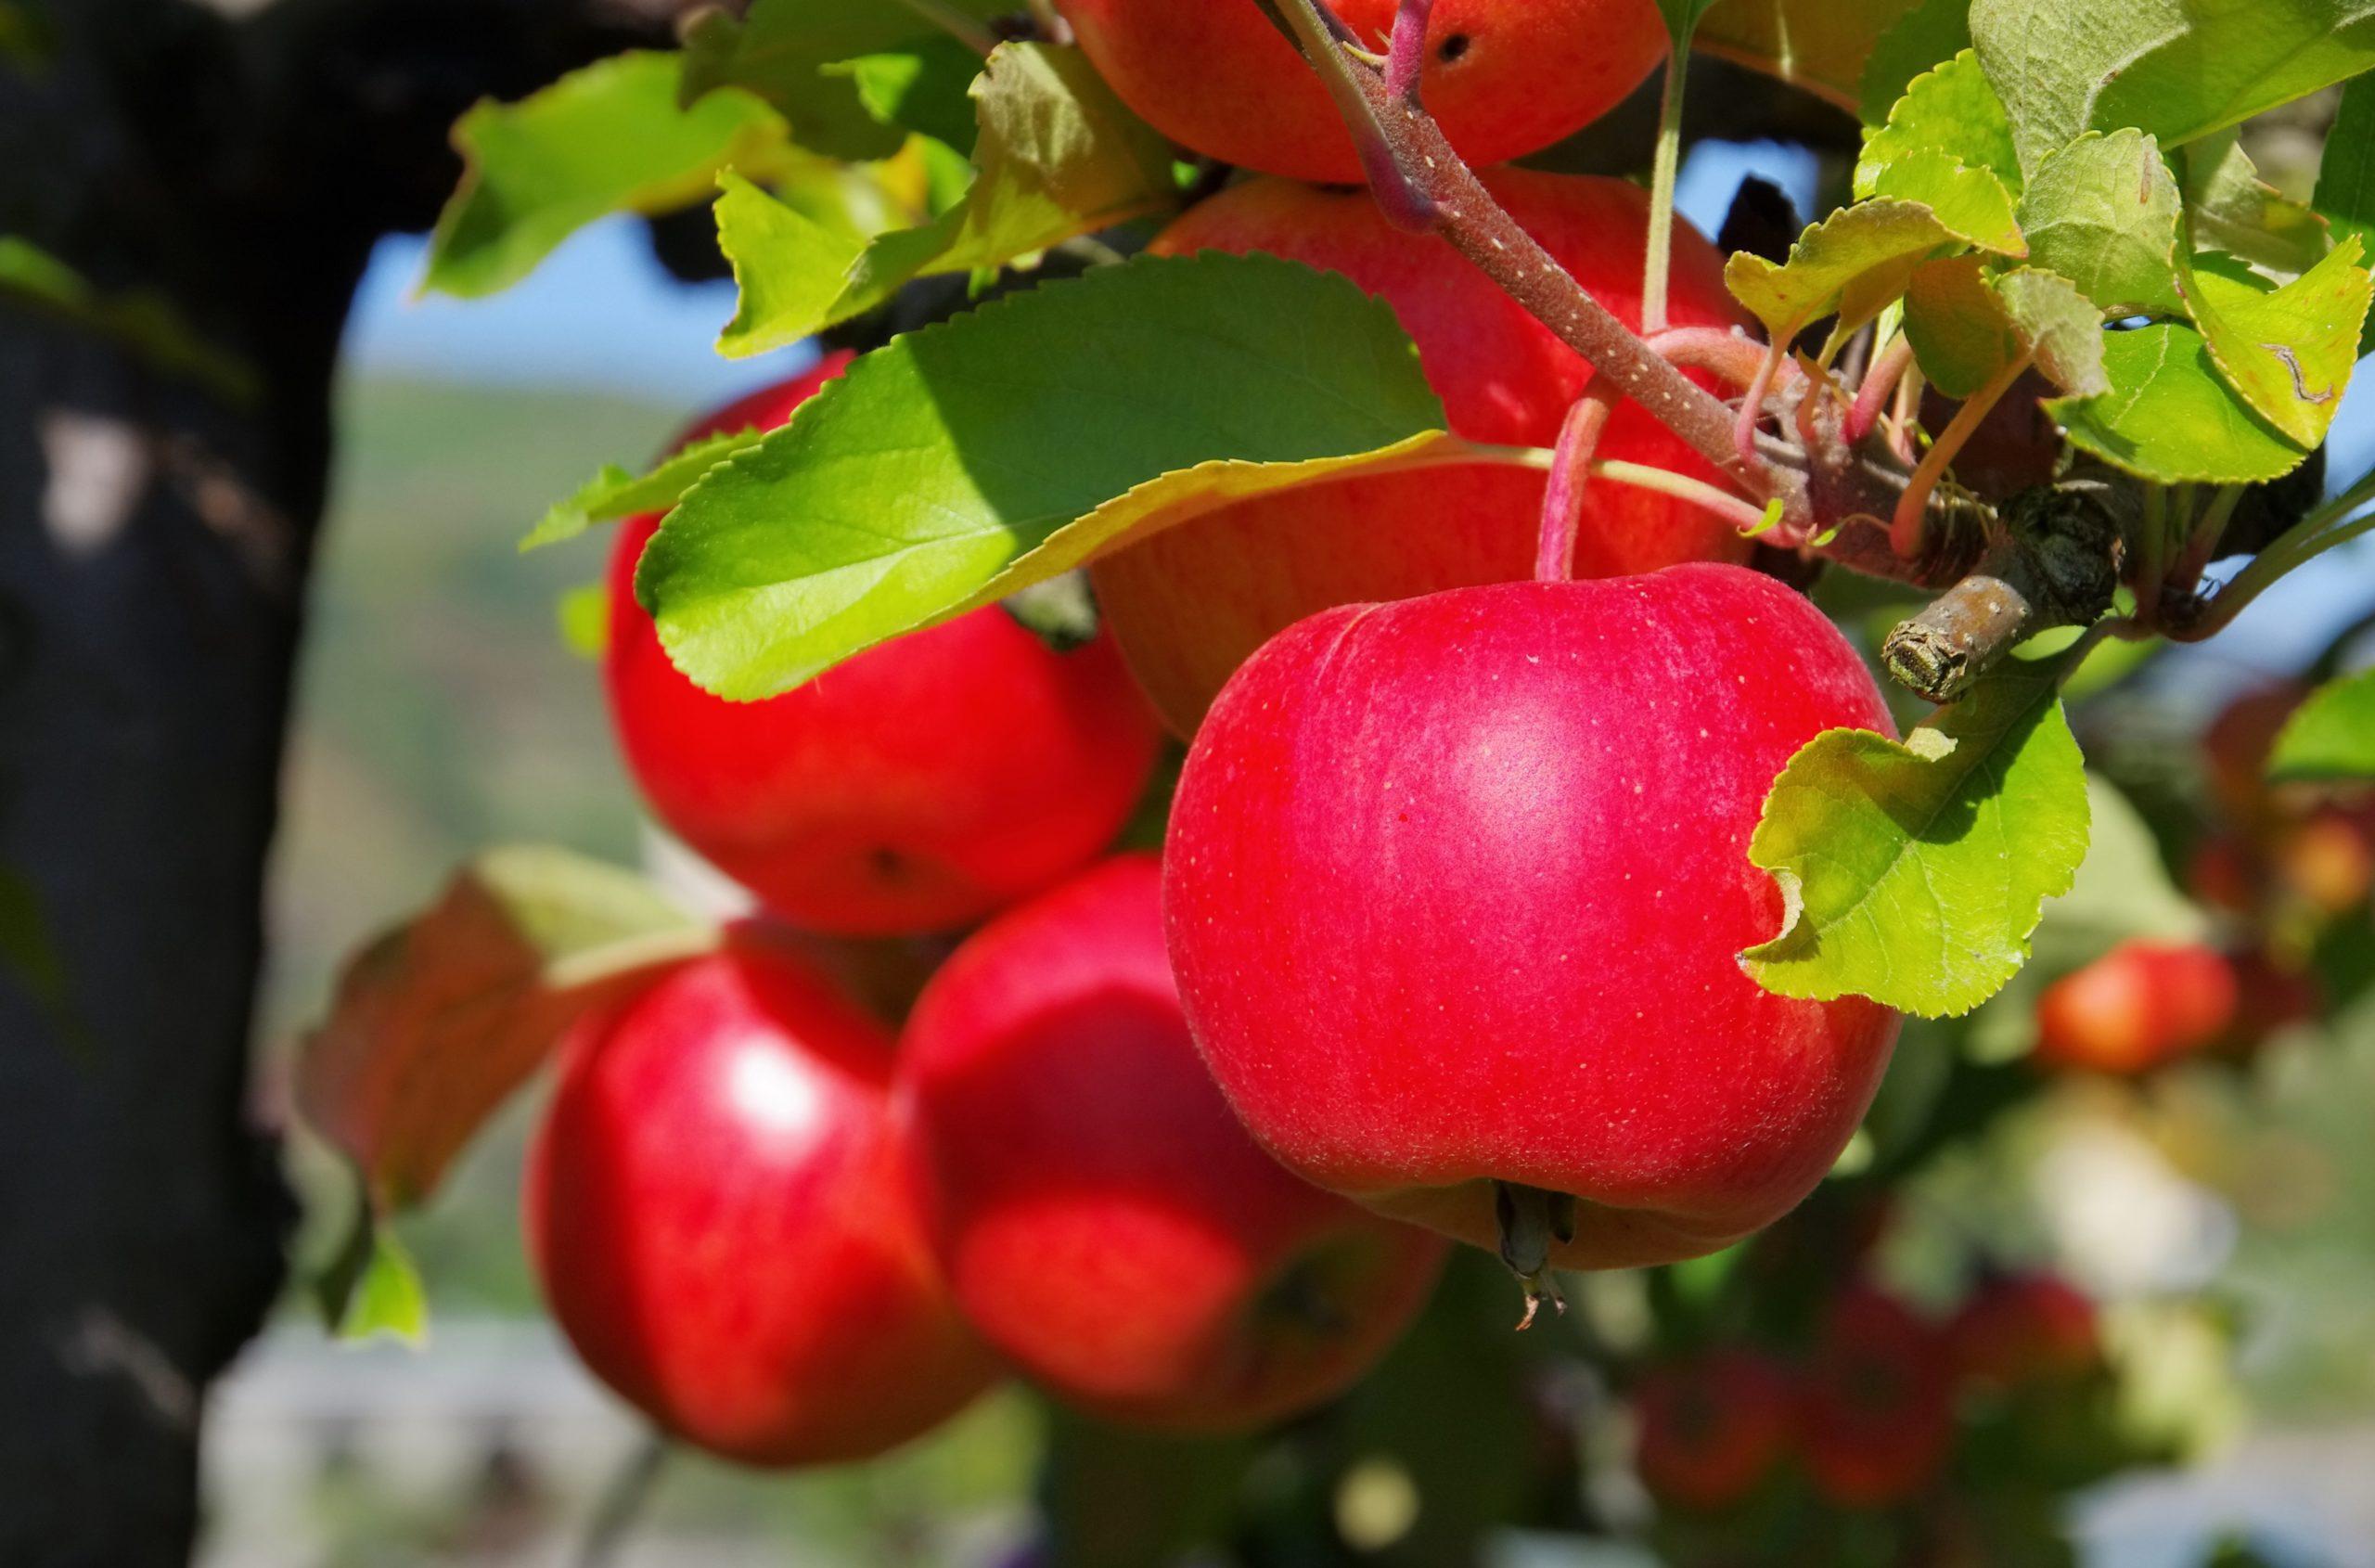 6188209 apfel am baum apple on tree 151 scaled